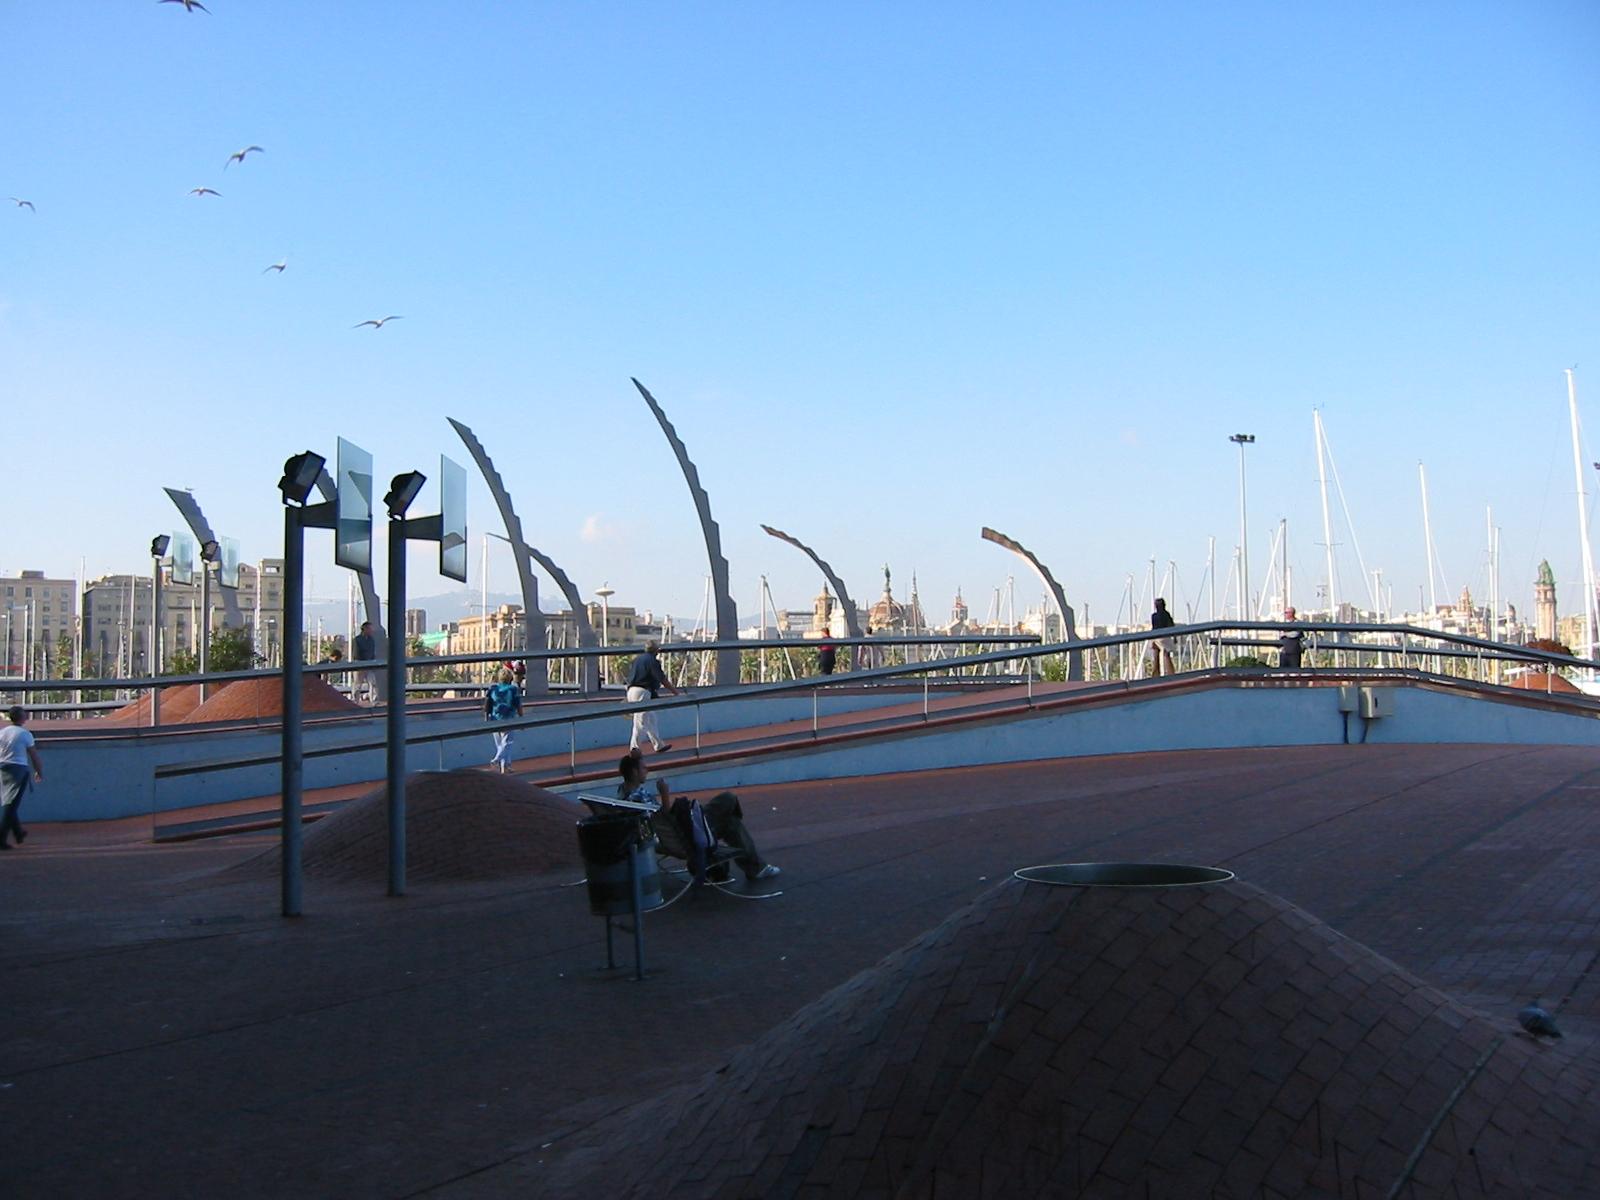 architecture exteriors spain barca barcelona harbour boulevard cityscape bench lamppost art sculptures people